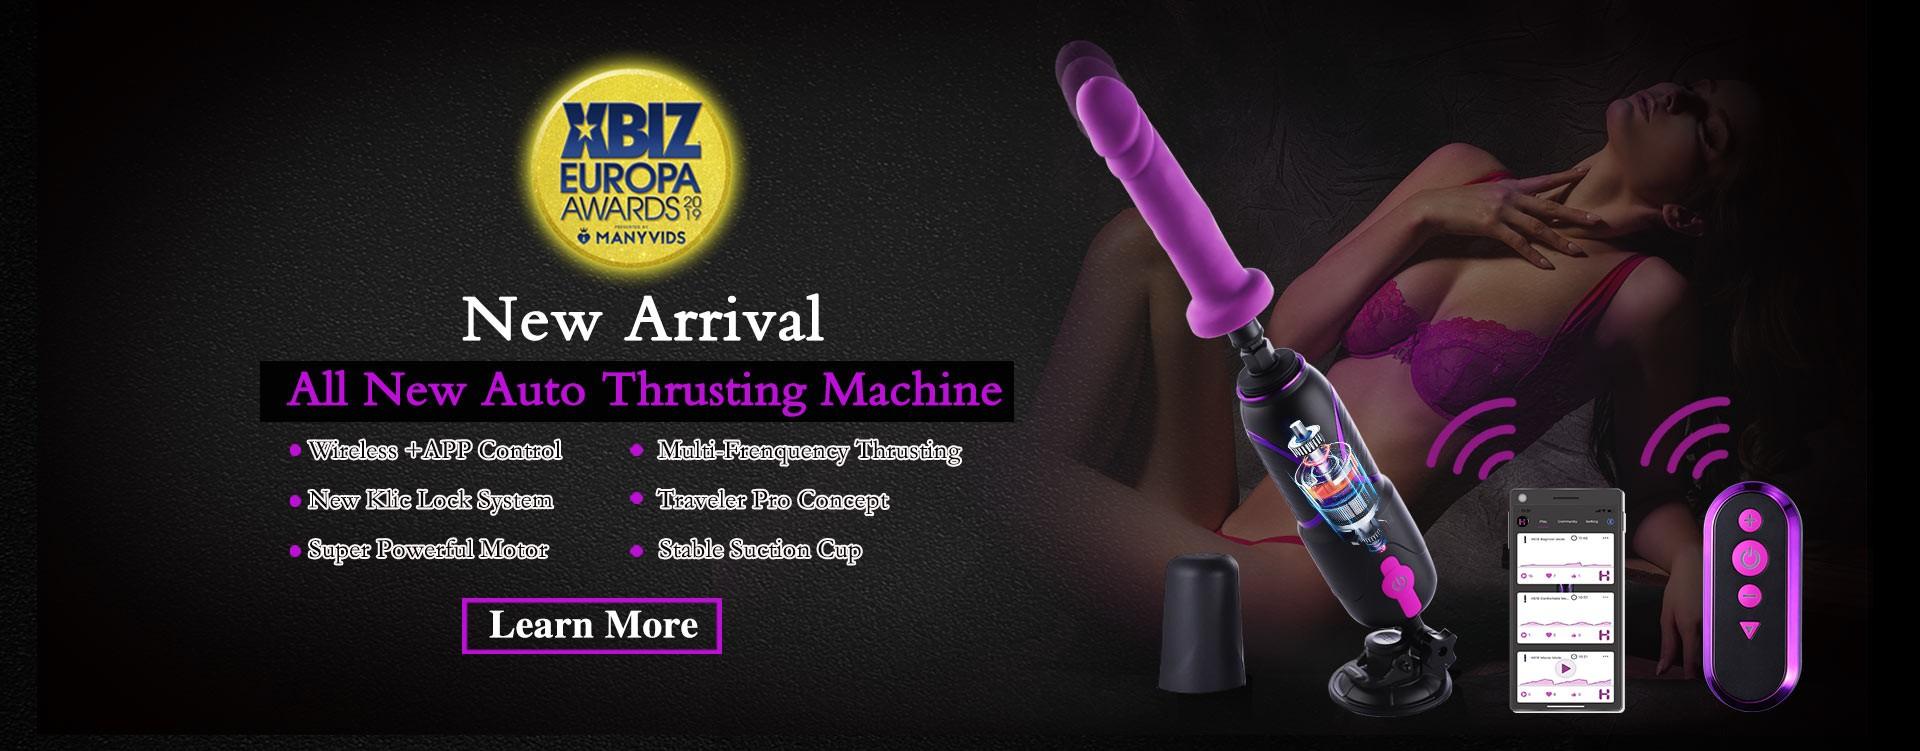 Hismith Pro Traveler Sex Machine